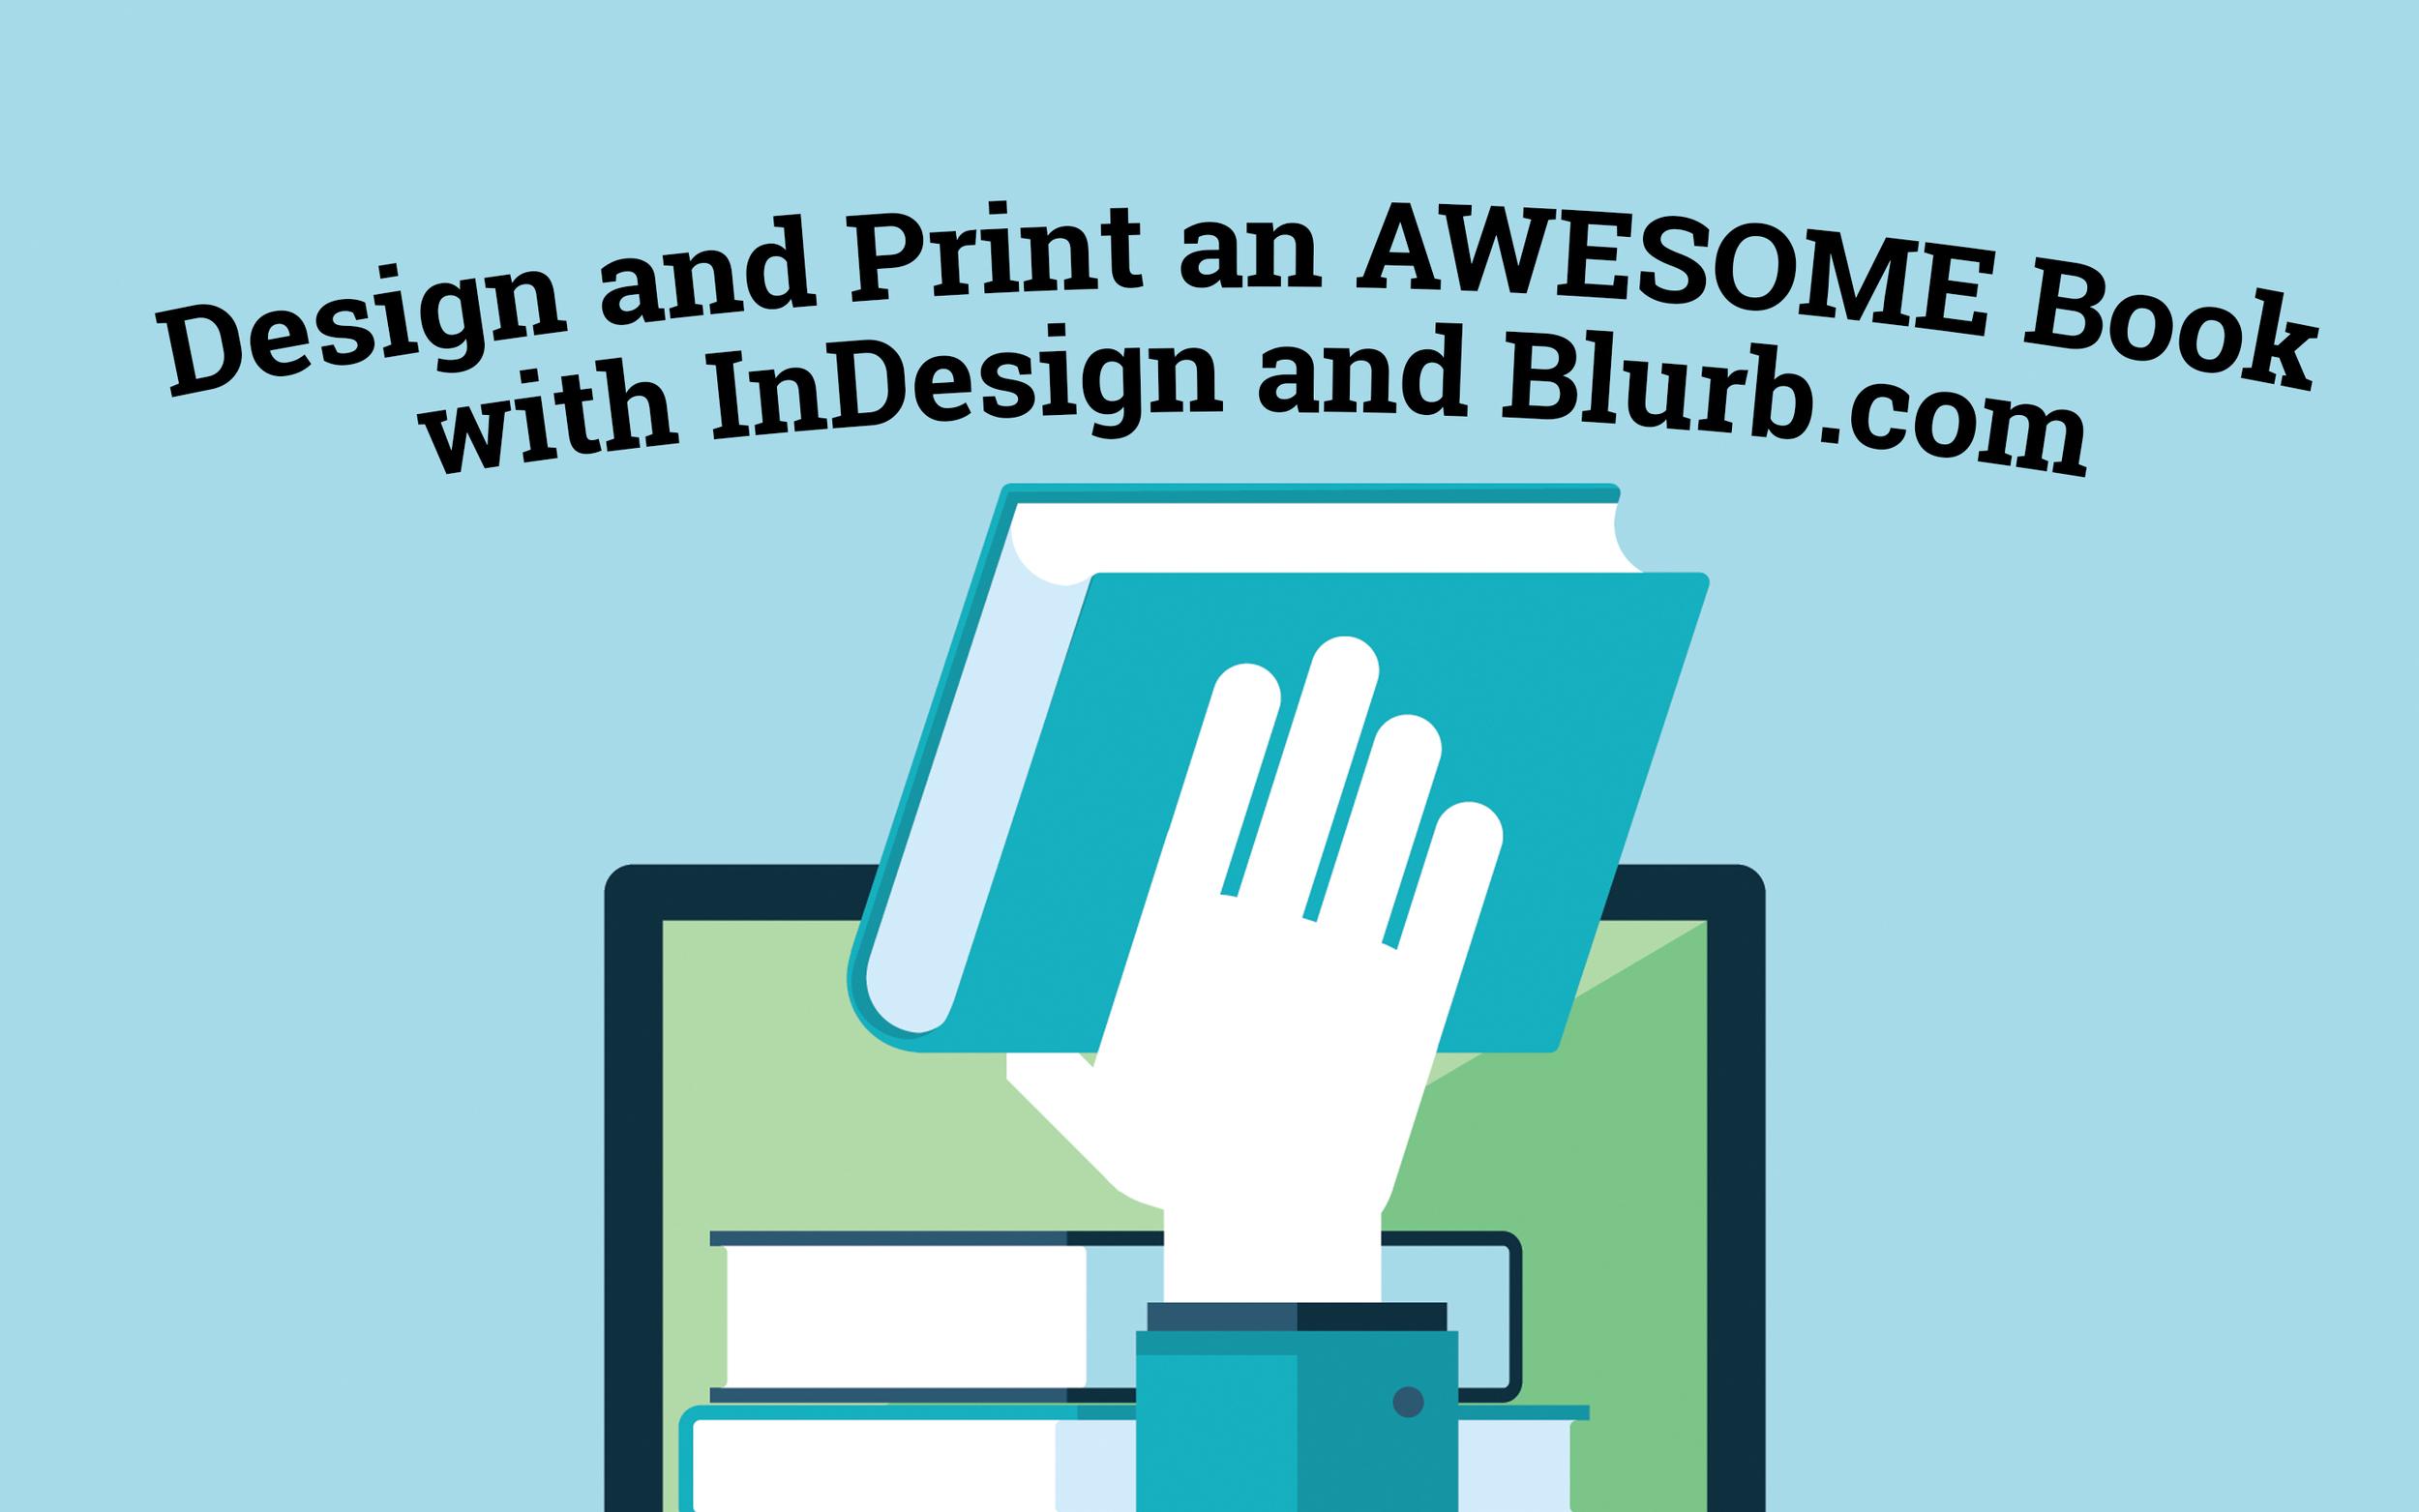 designingabookwithblurbandindesign